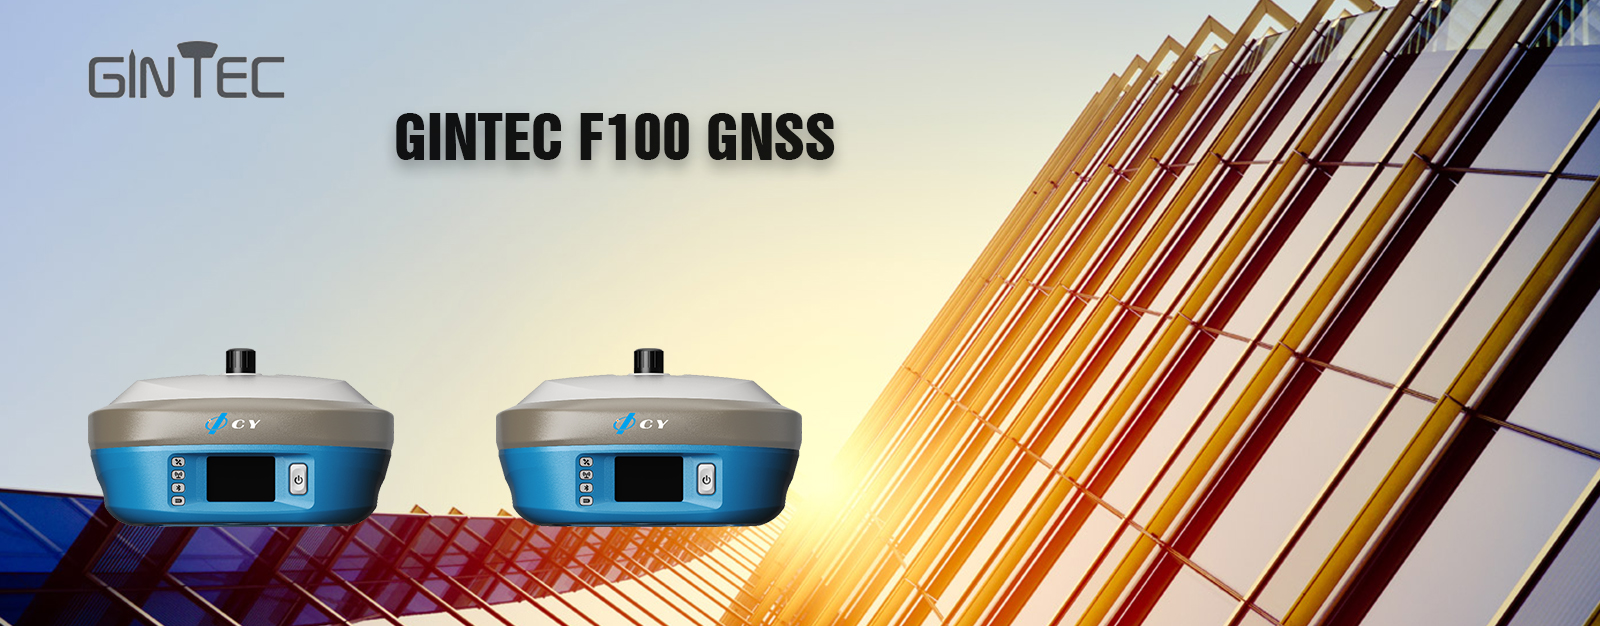 GINTEC-F100